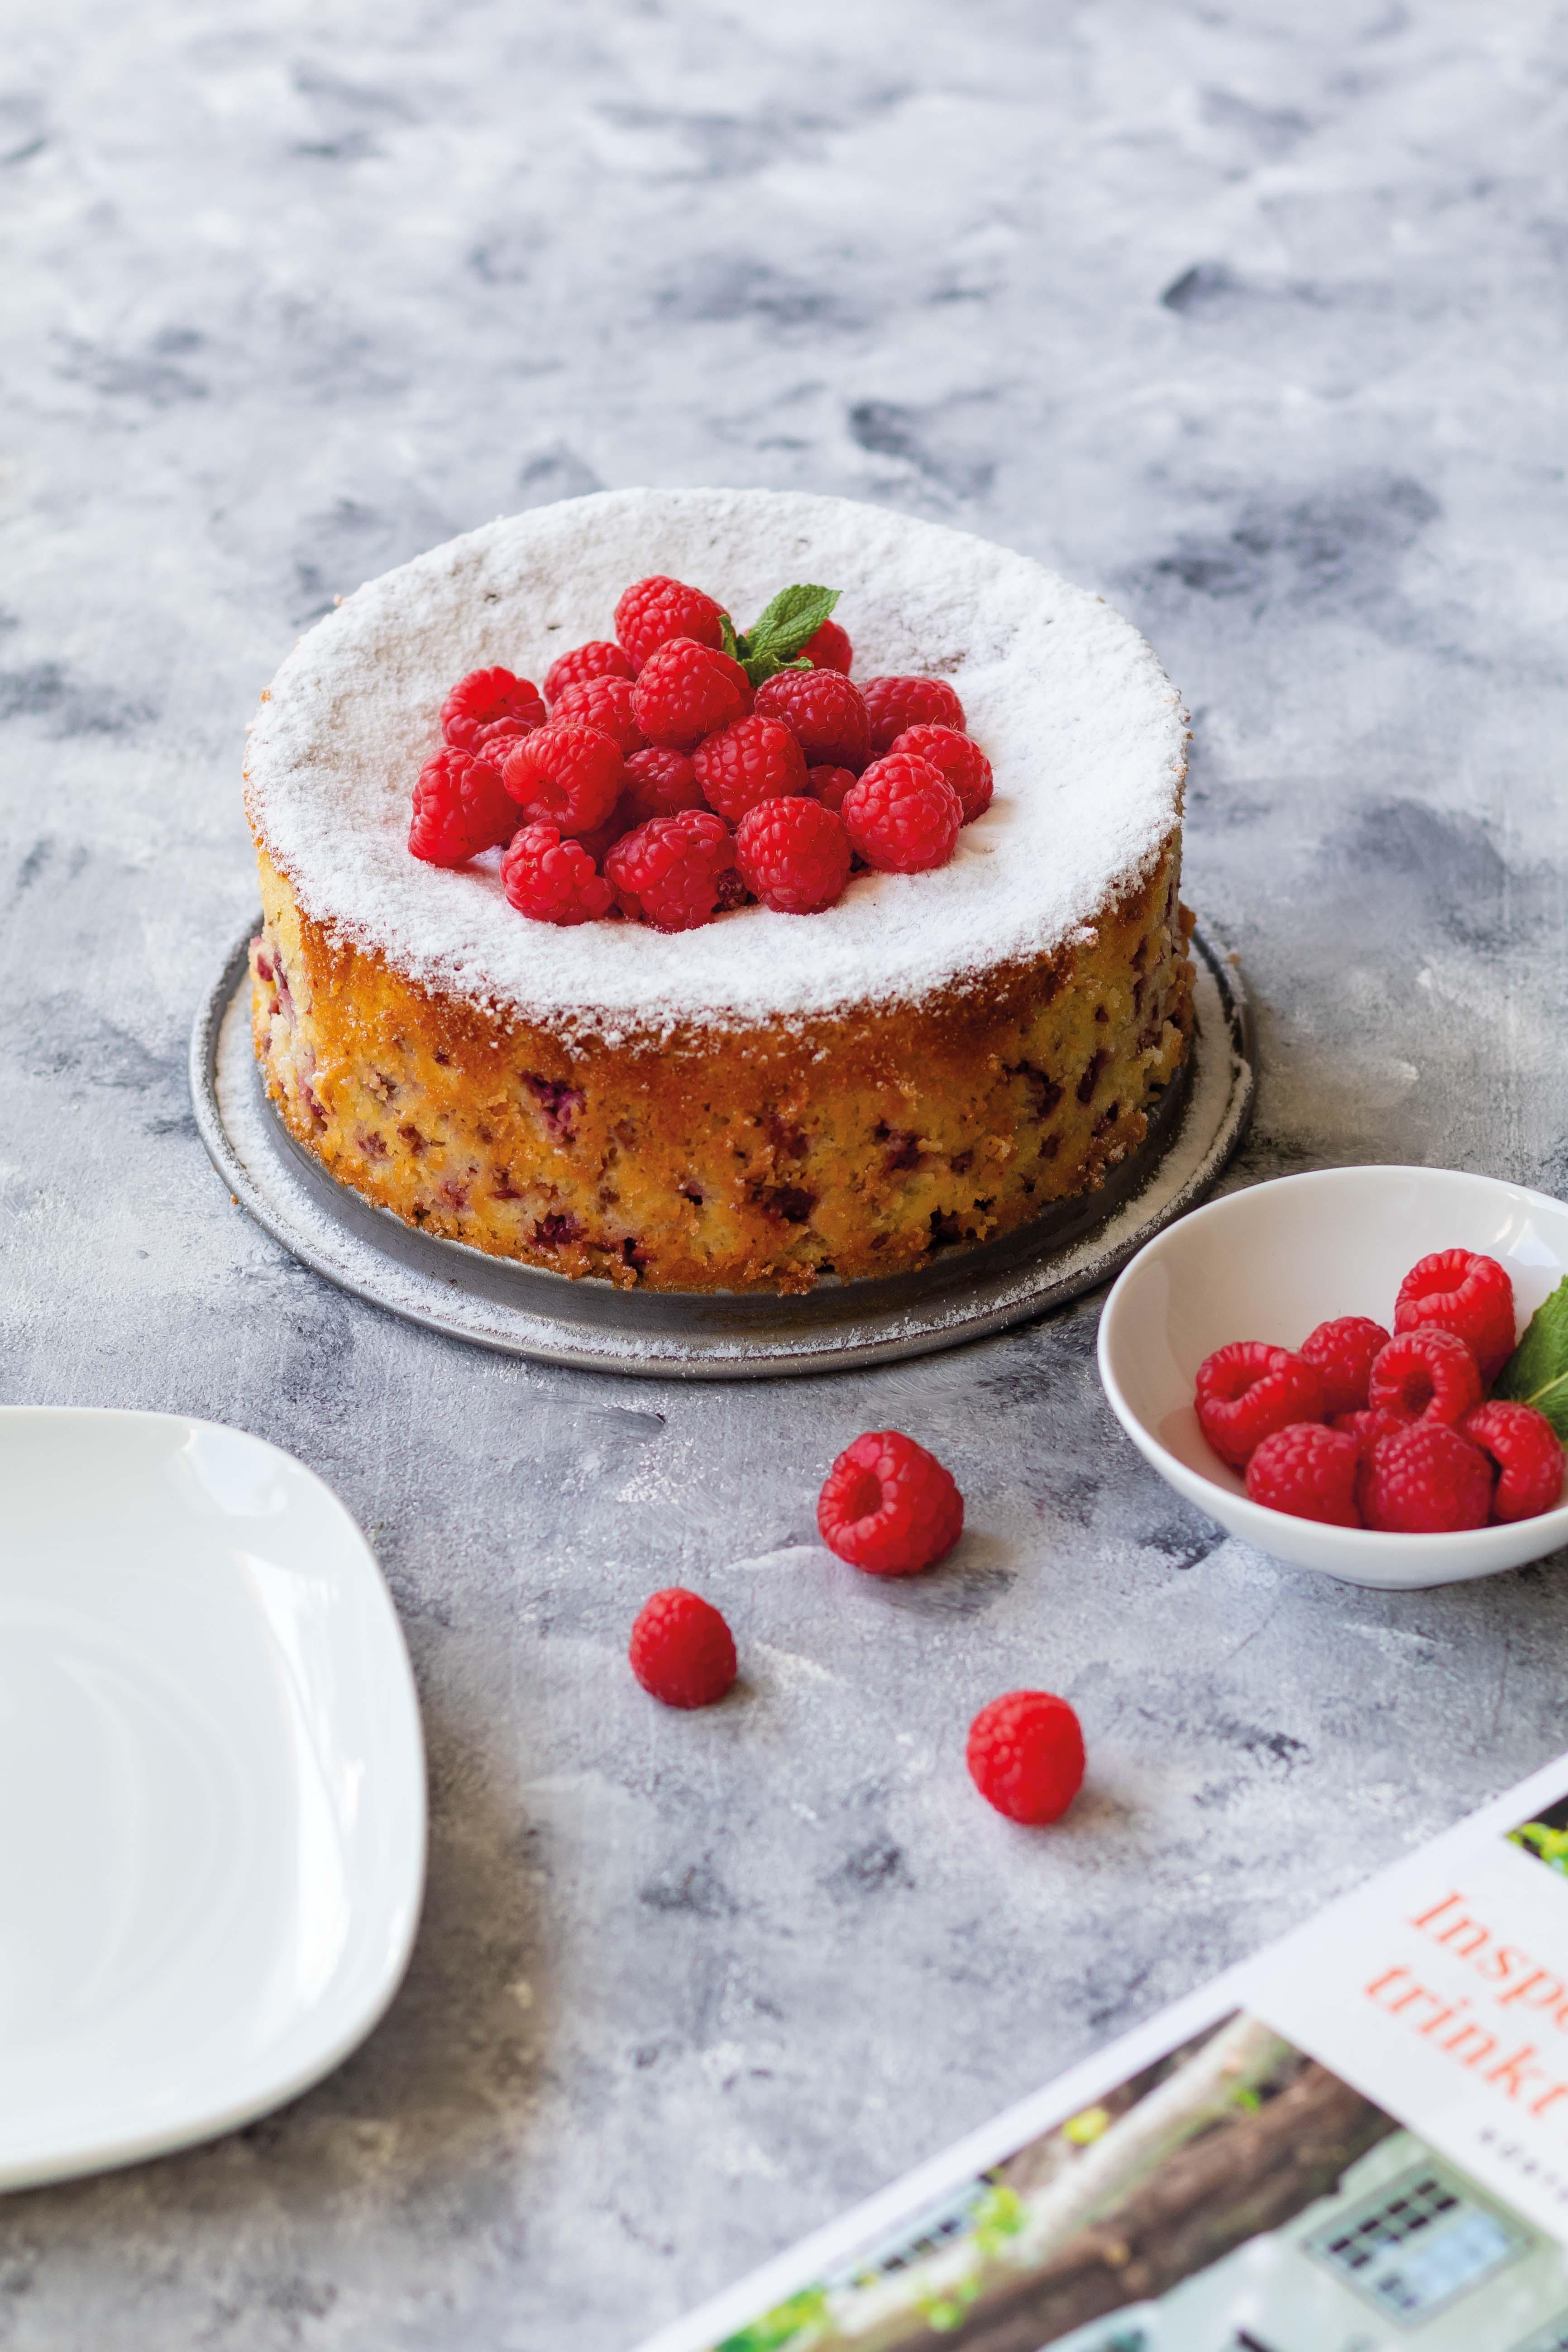 Mandel Himbeer Kuchen // Almond Raspberry Cake by https://babyrockmyday.com/mandel-himbeer-kuchen/